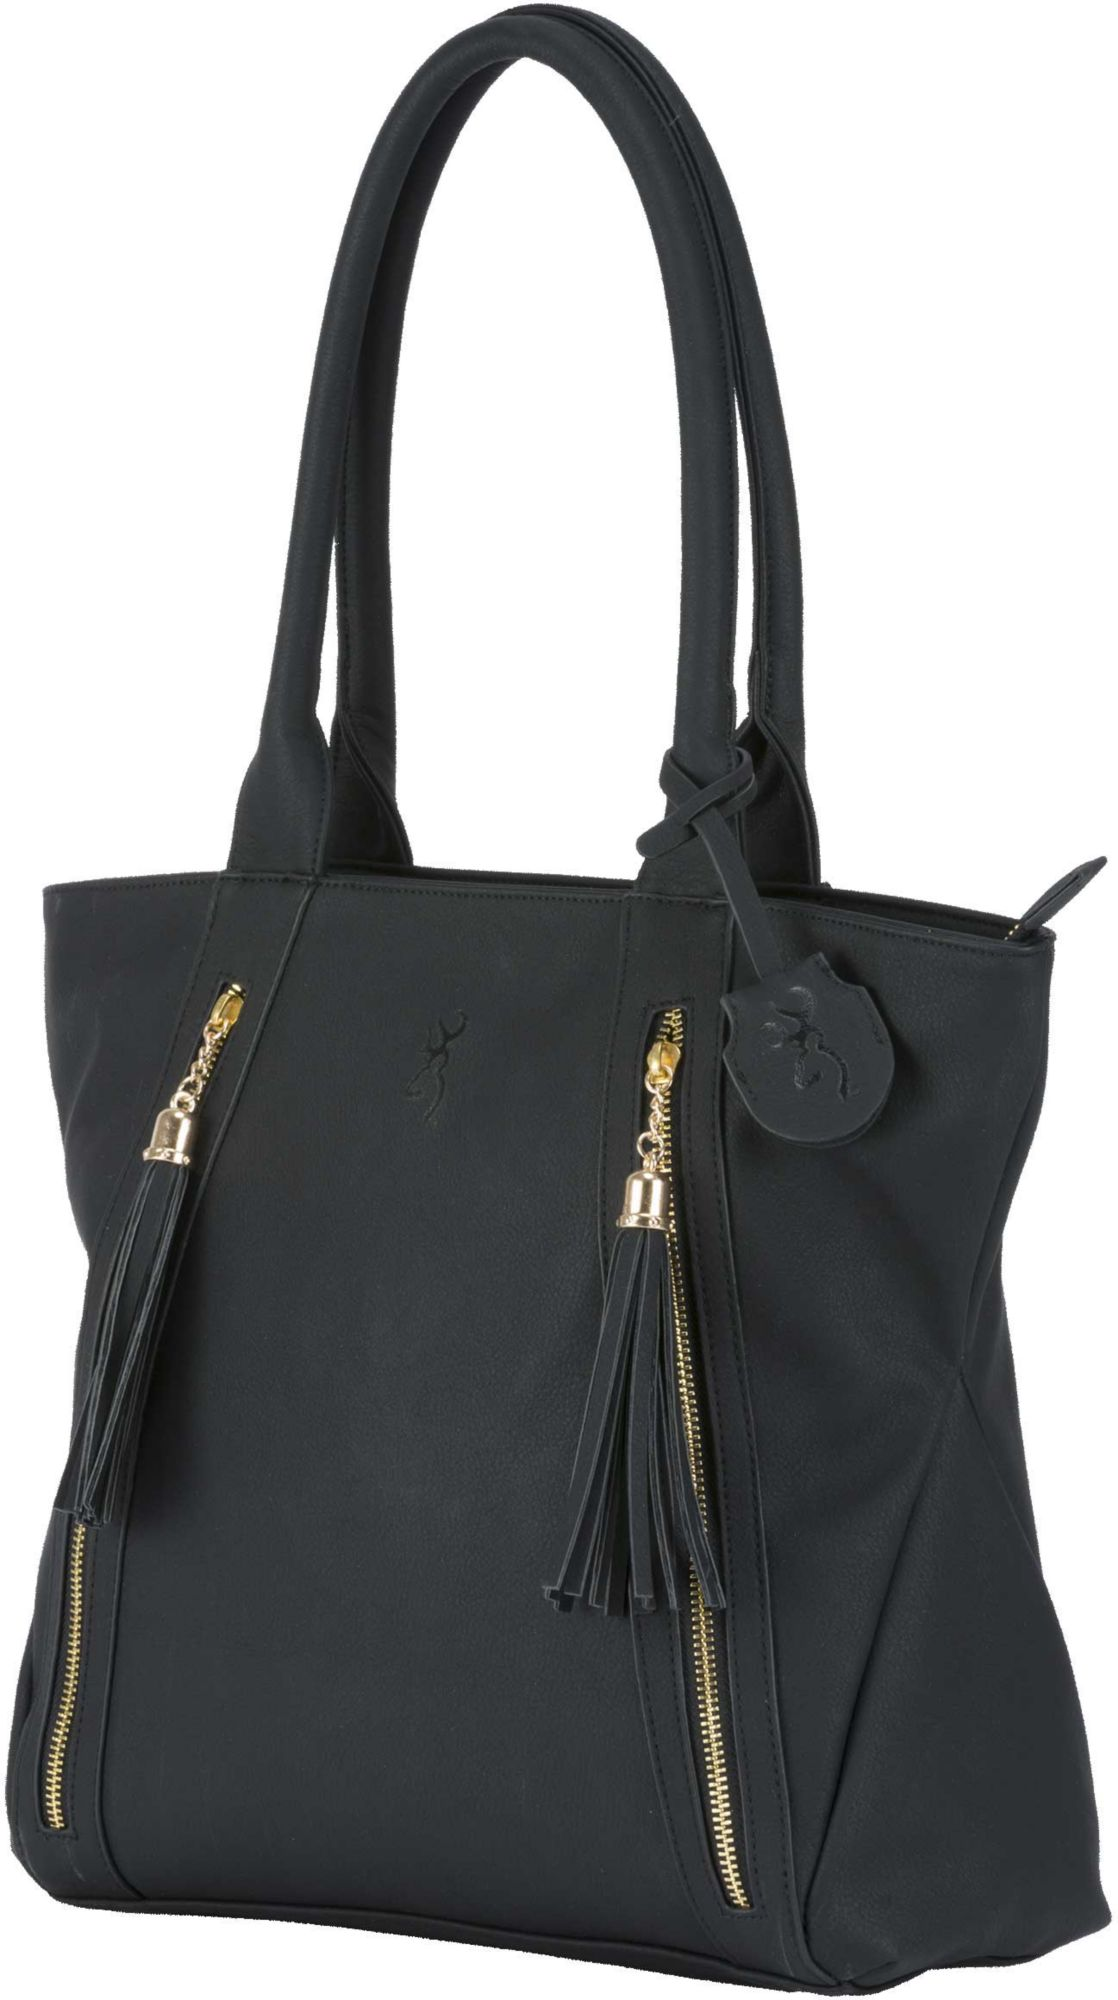 Browning Women's Alexandria Large Handbag, Size: One size, Black